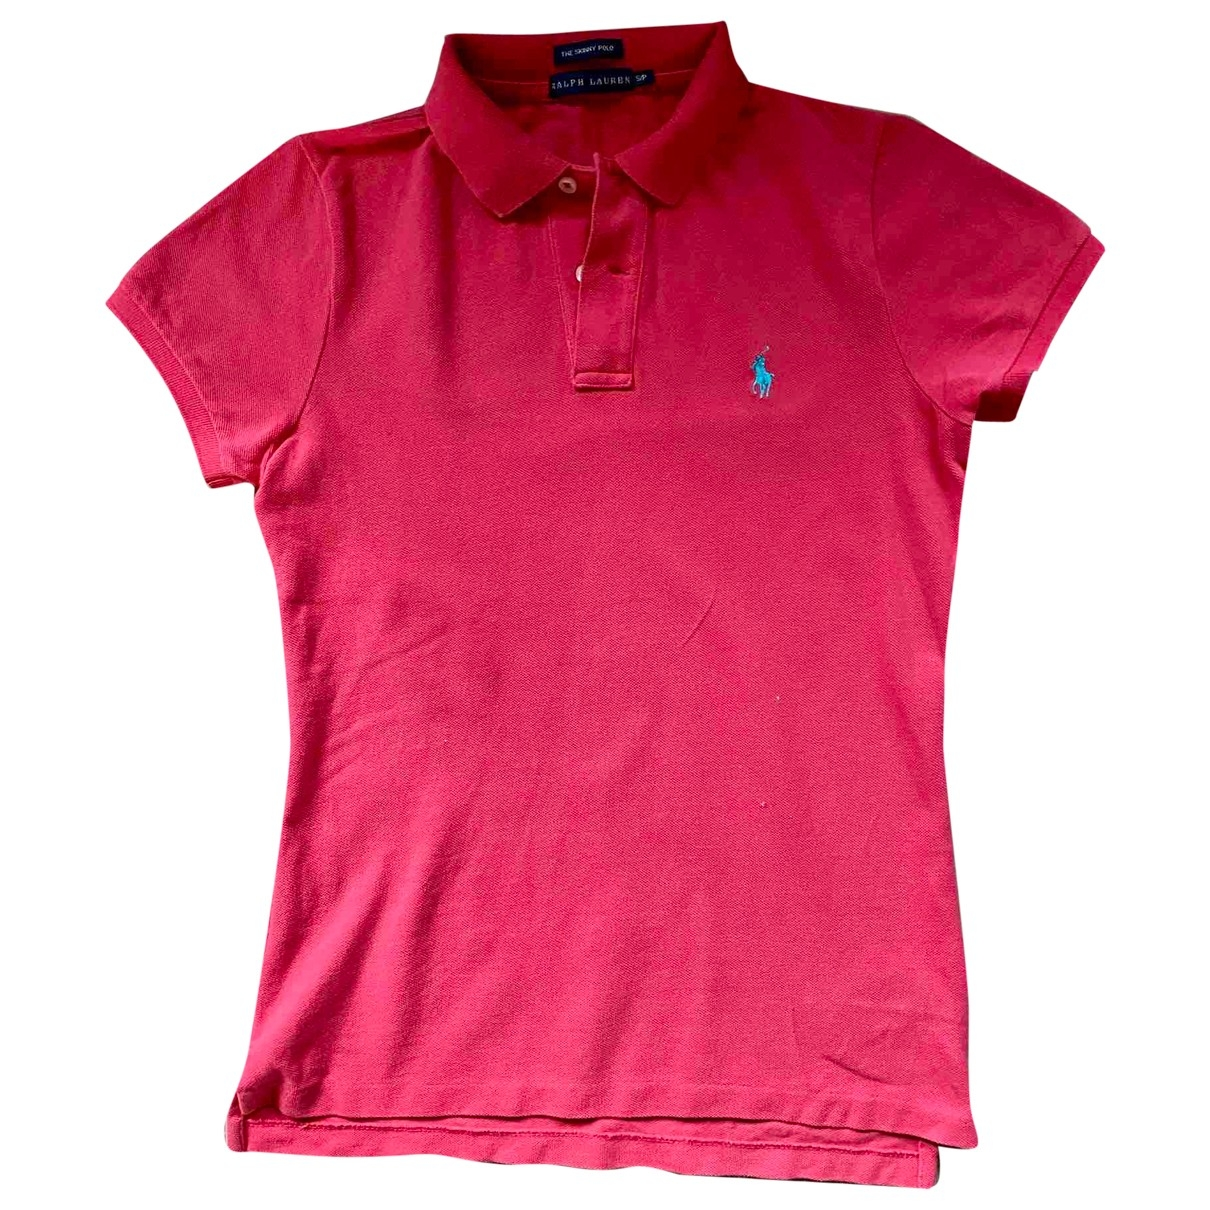 Polo Ralph Lauren Polo classique manches courtes Pink Cotton  top for Women S International